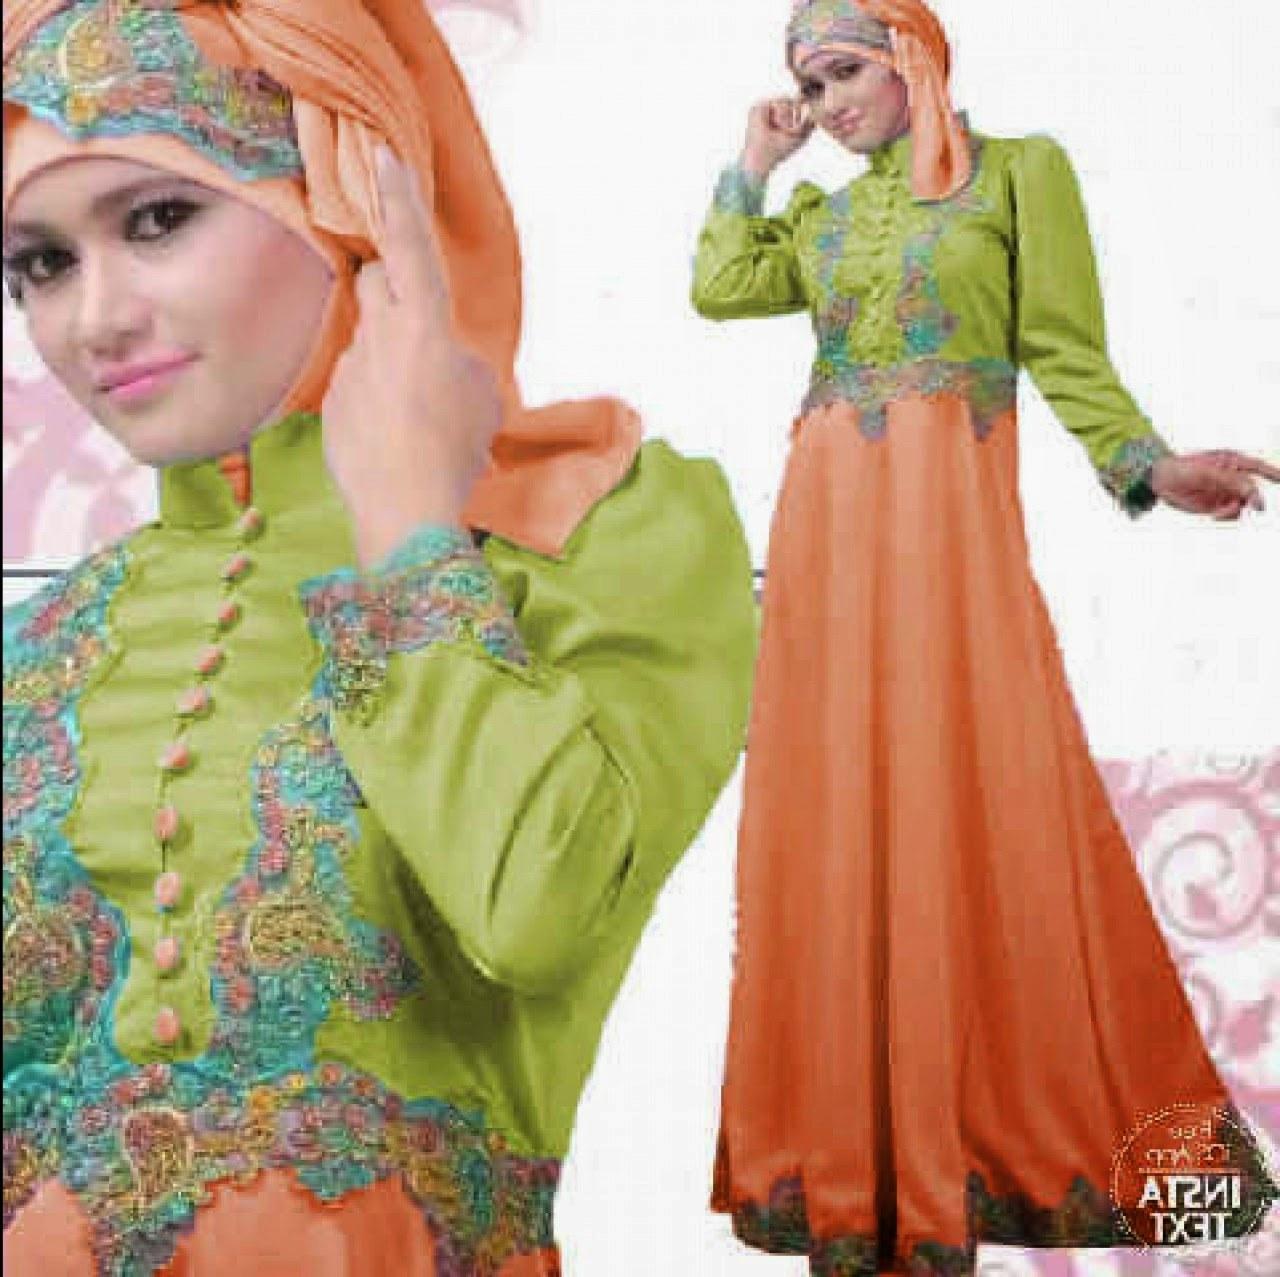 Bentuk Model Baju Lebaran Wanita 2018 Bqdd Kumpulan Foto Model Baju Kebaya Lebaran Terbaru 2018